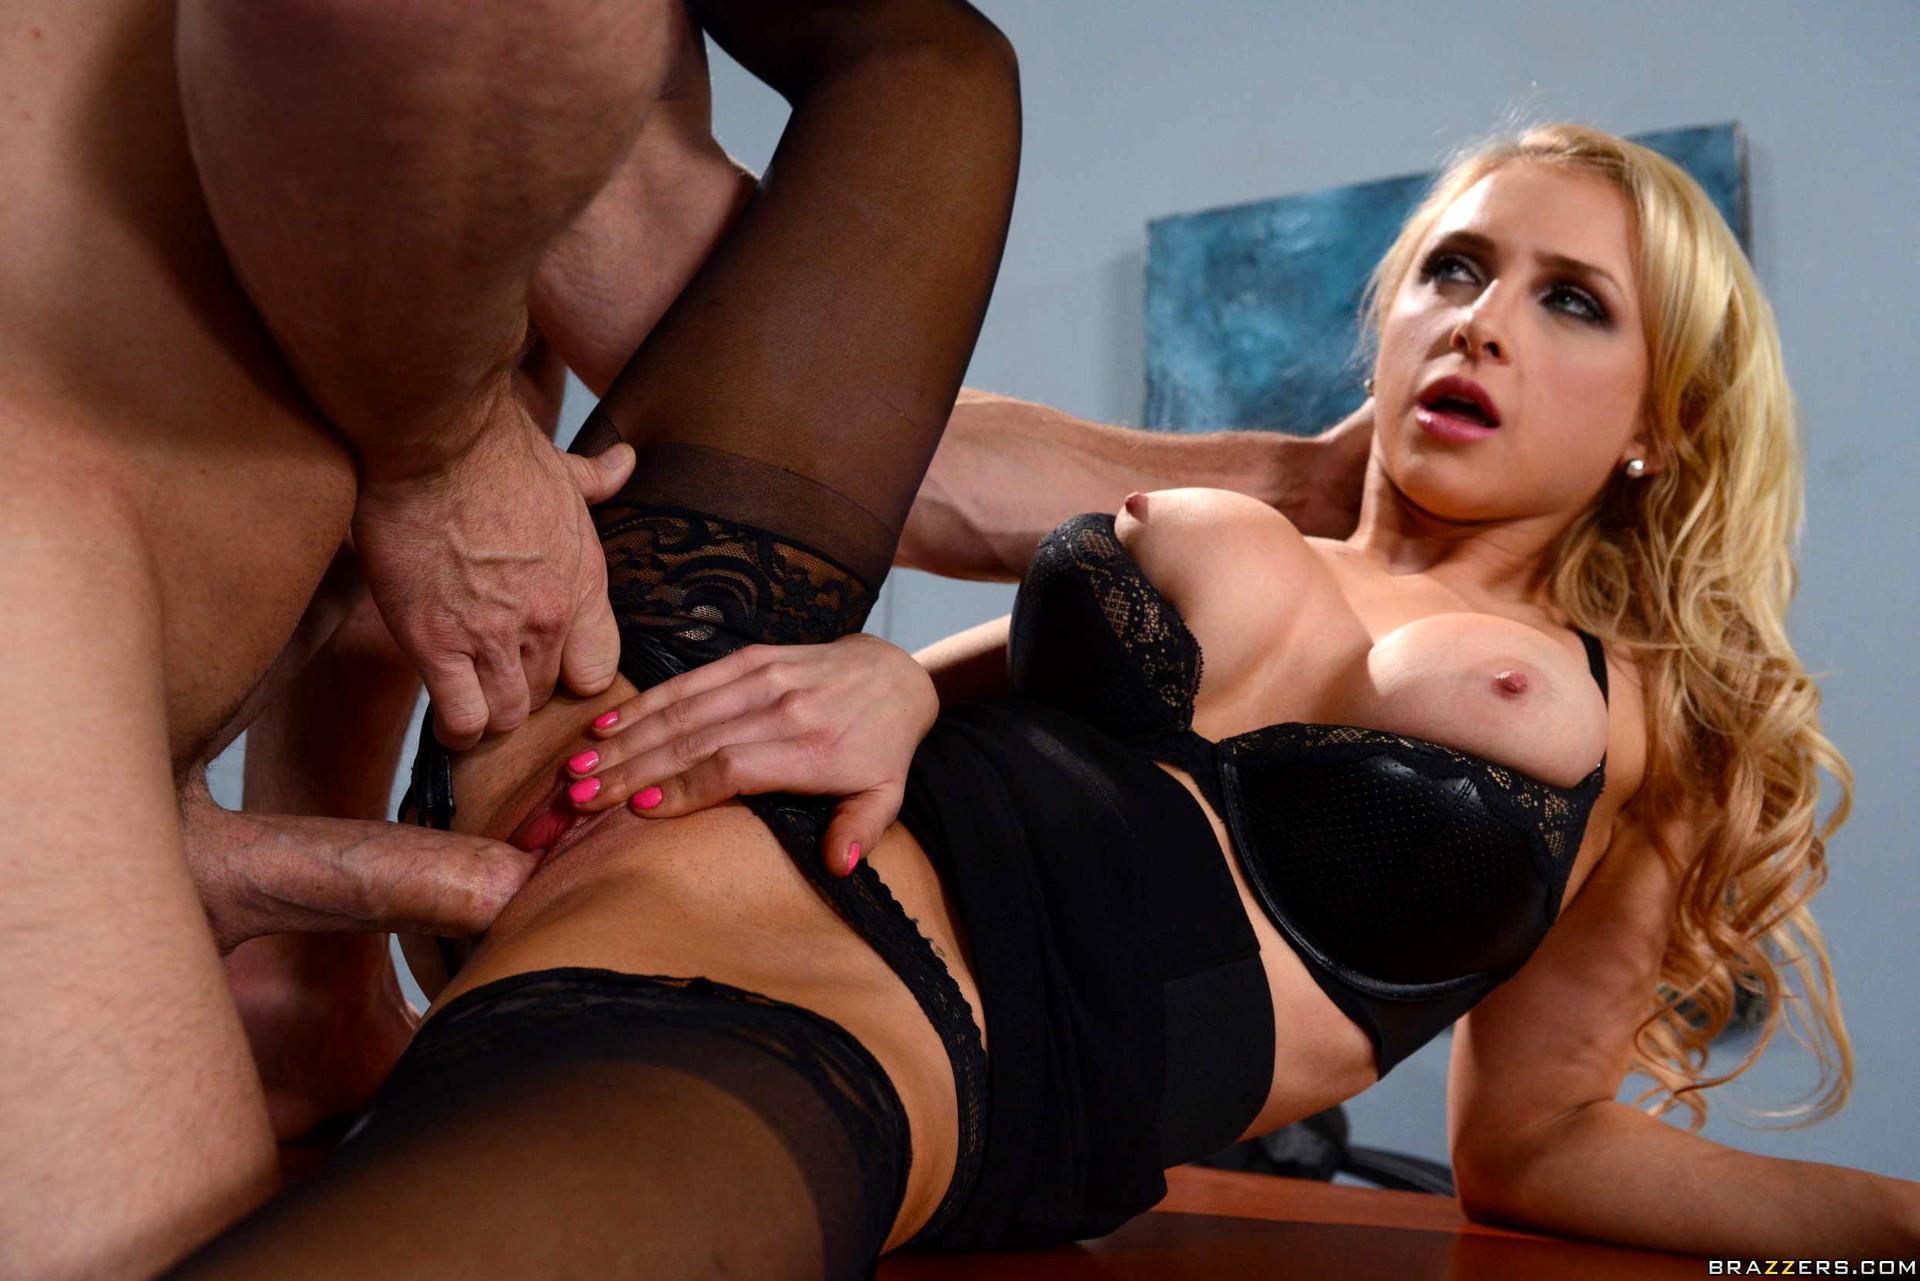 Hot secretary kortney kane plays with her boss